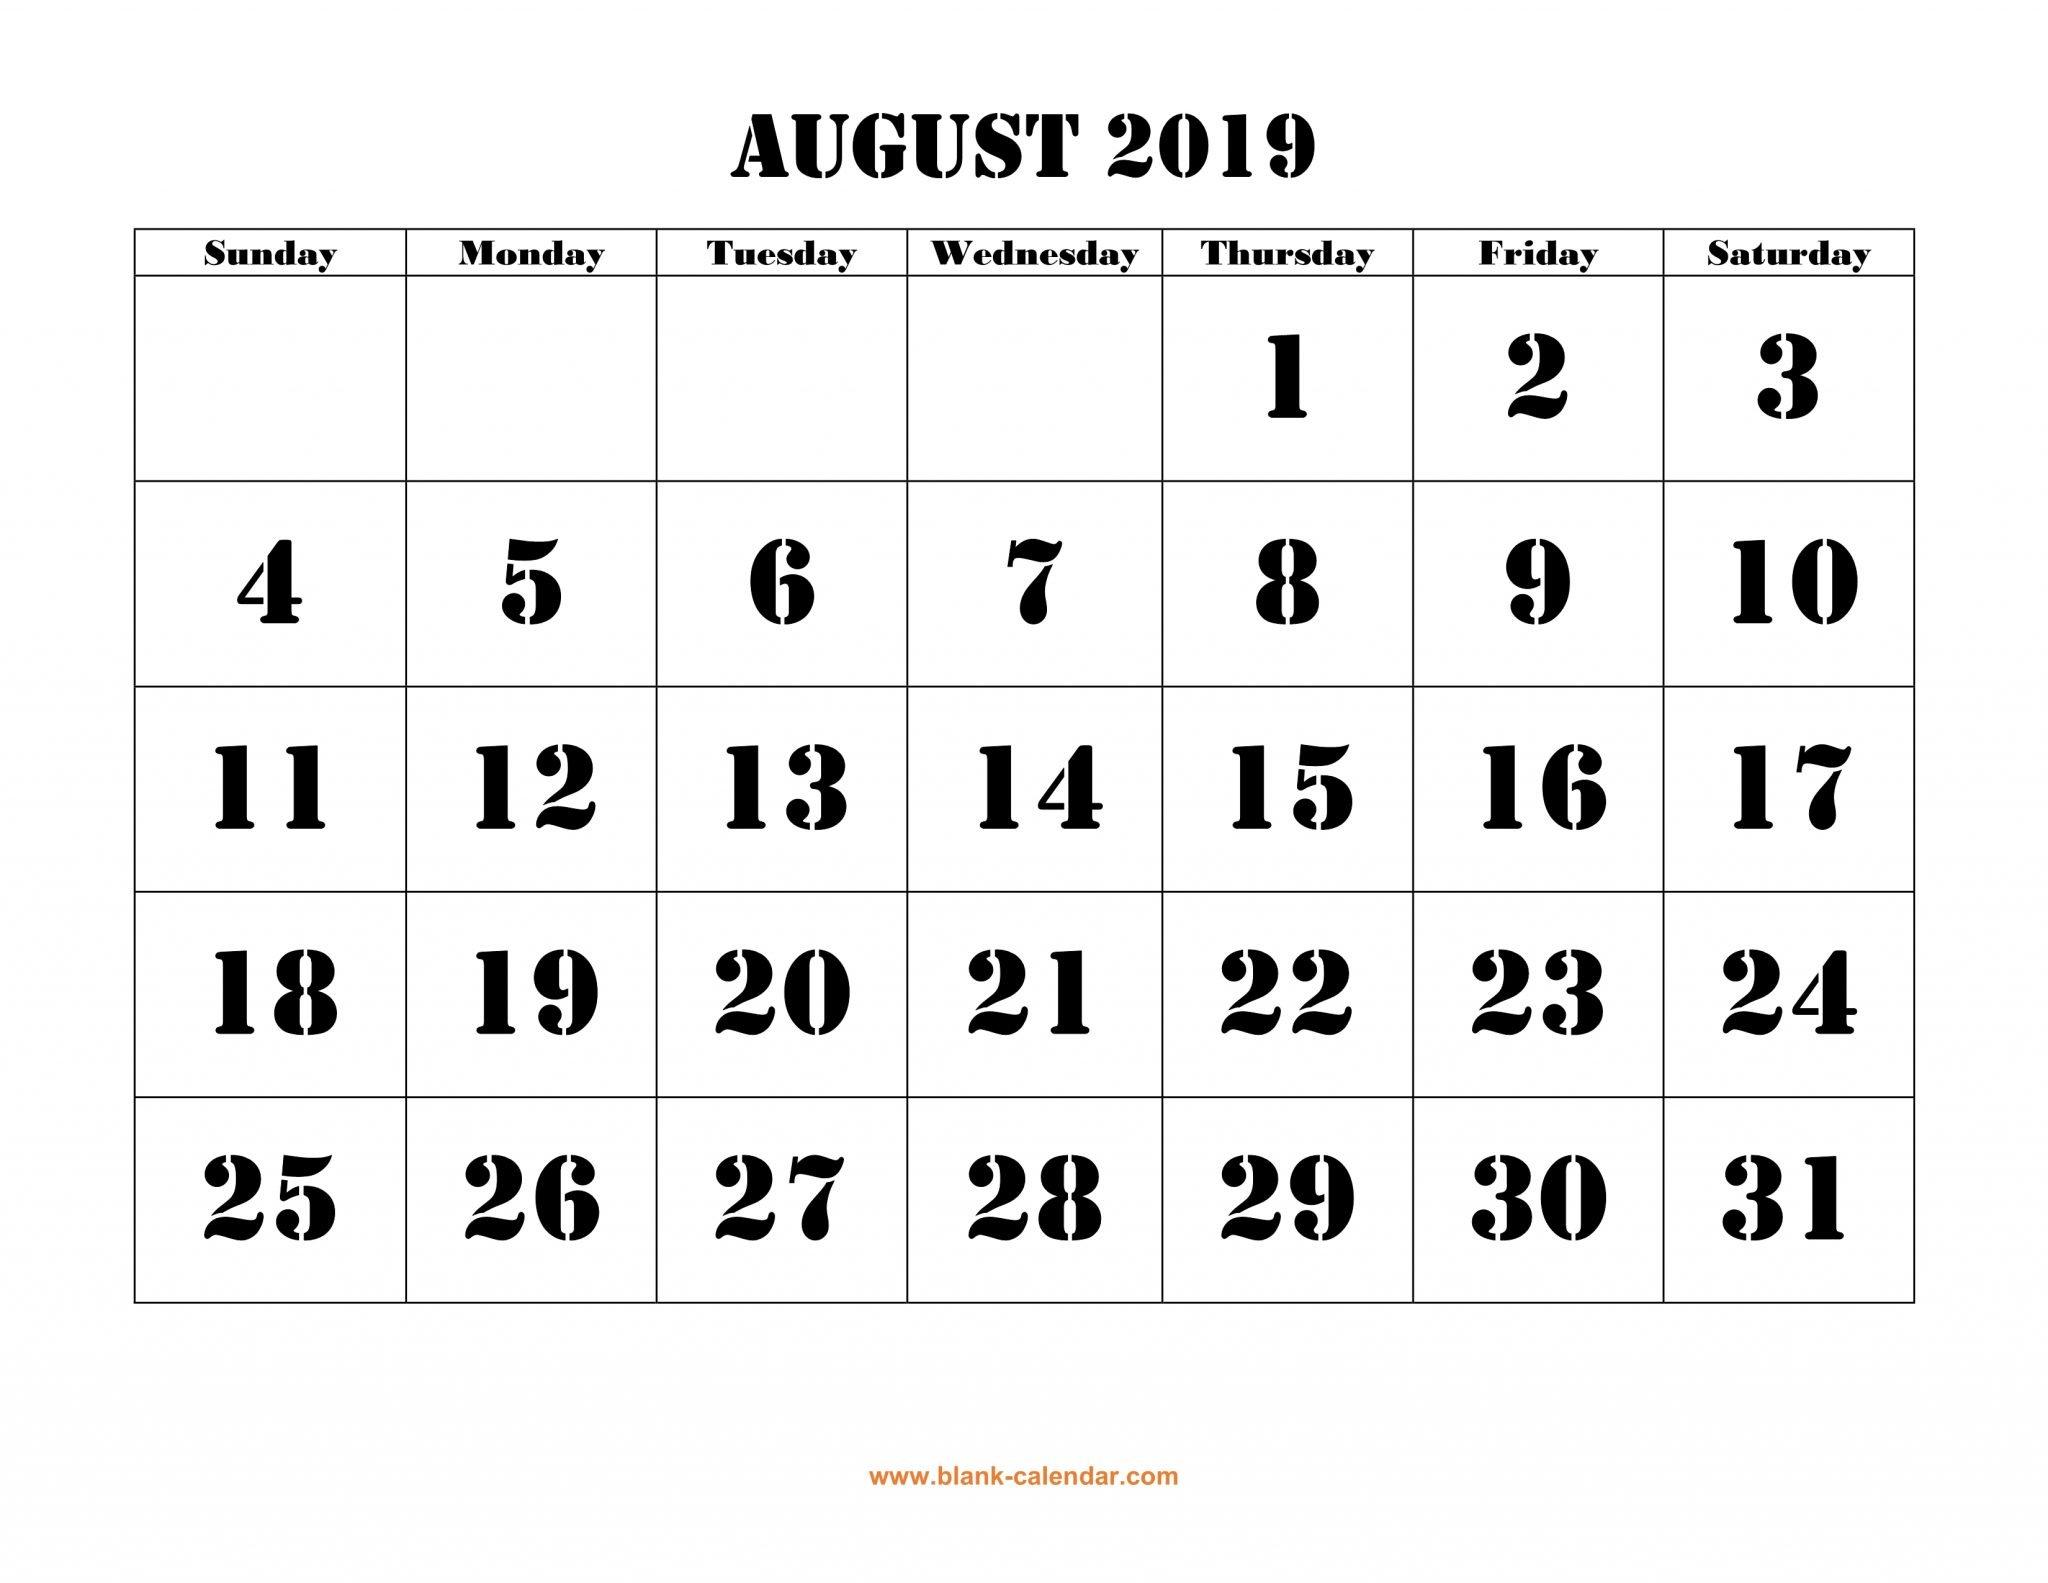 Calendar For August 2019 – Free Printable Calendar, Templates And August 9 2019 Calendar